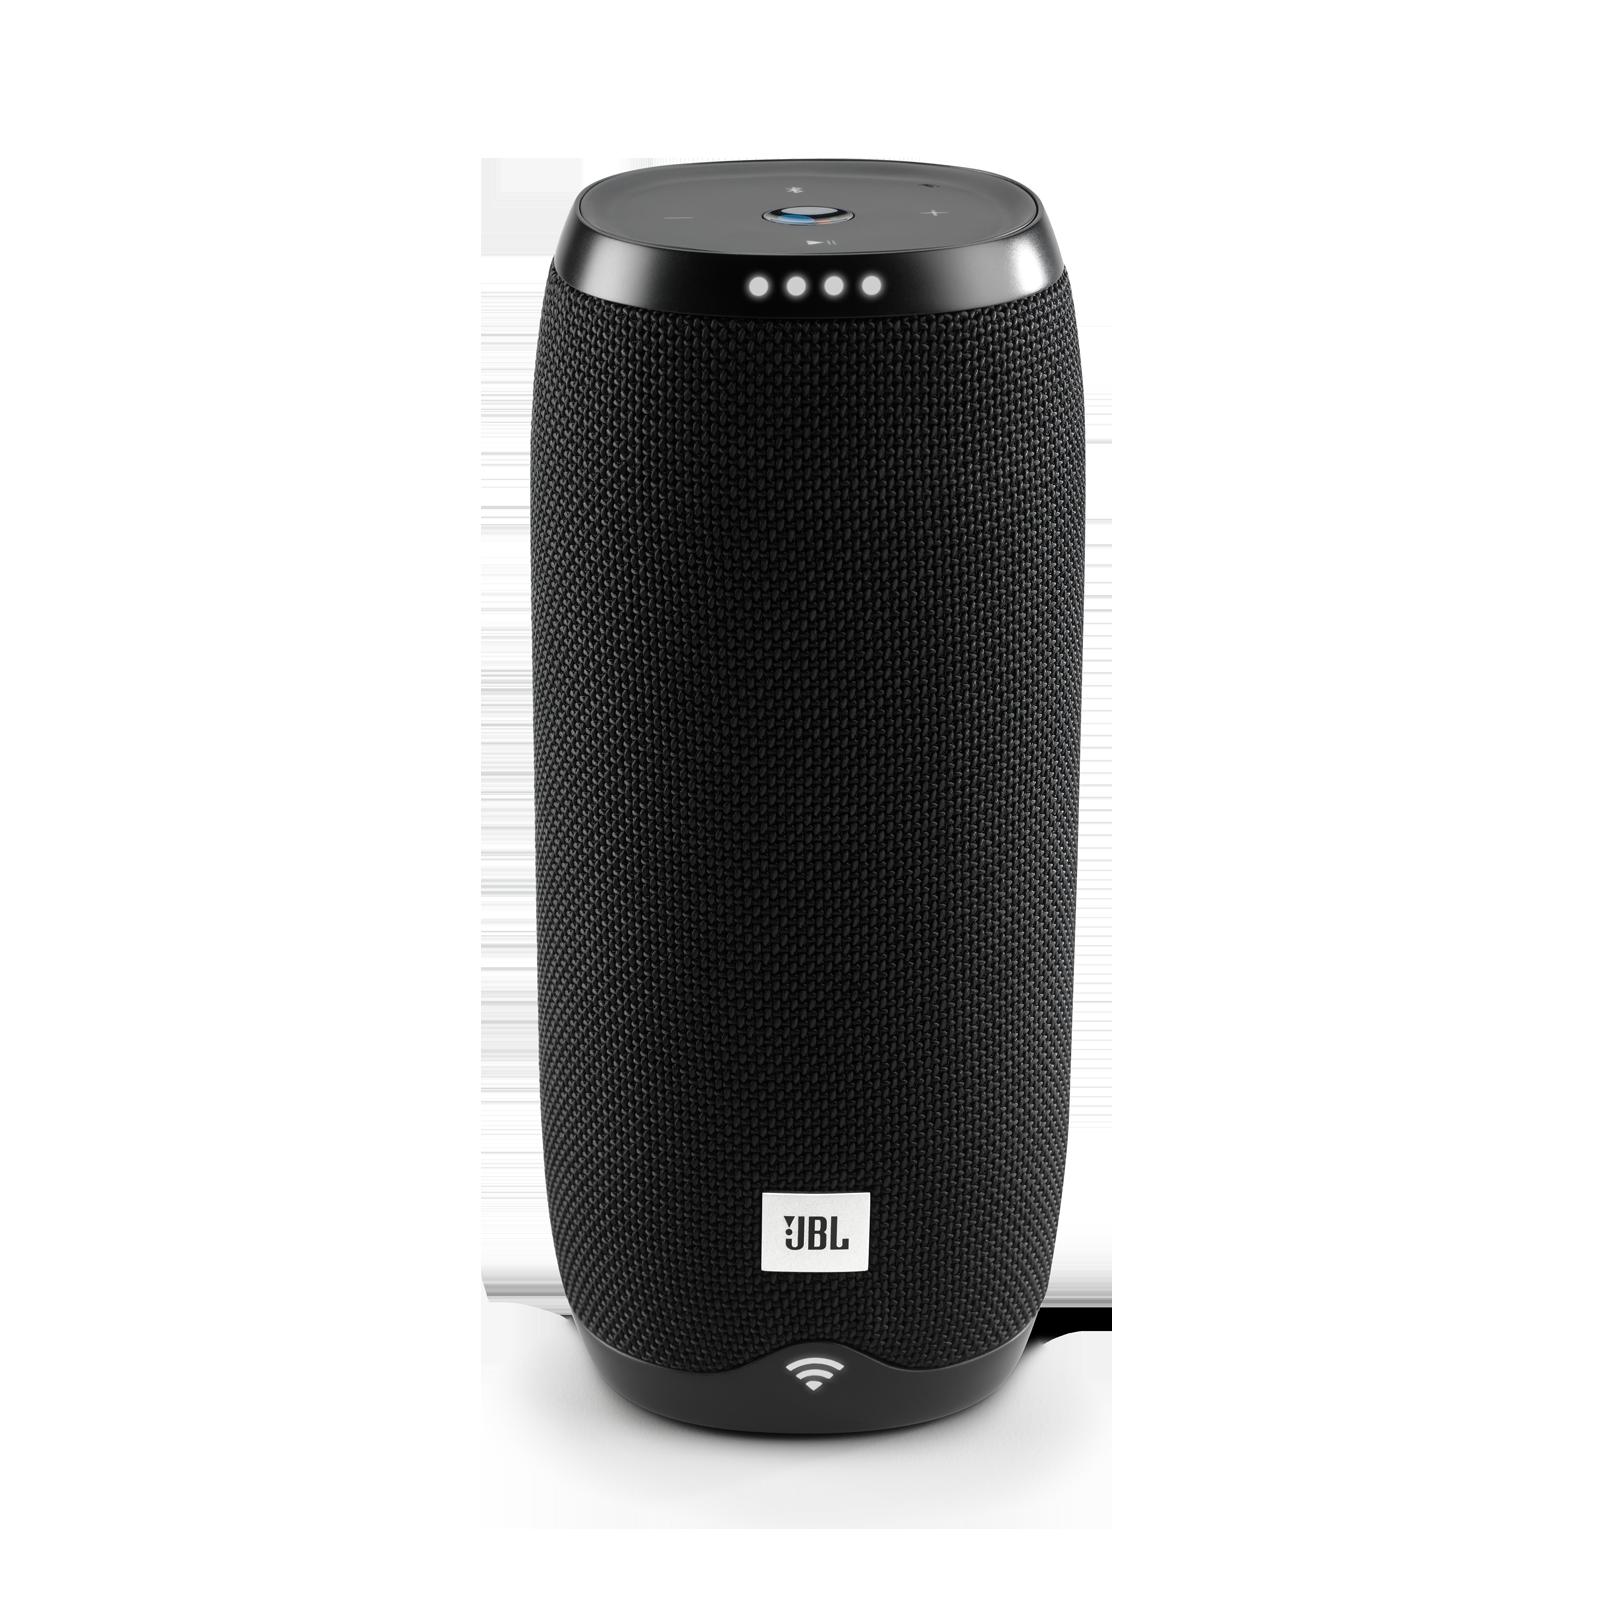 Jbl Link 20 Bluetooth Speakers Portable Waterproof Bluetooth Speaker Portable Speaker